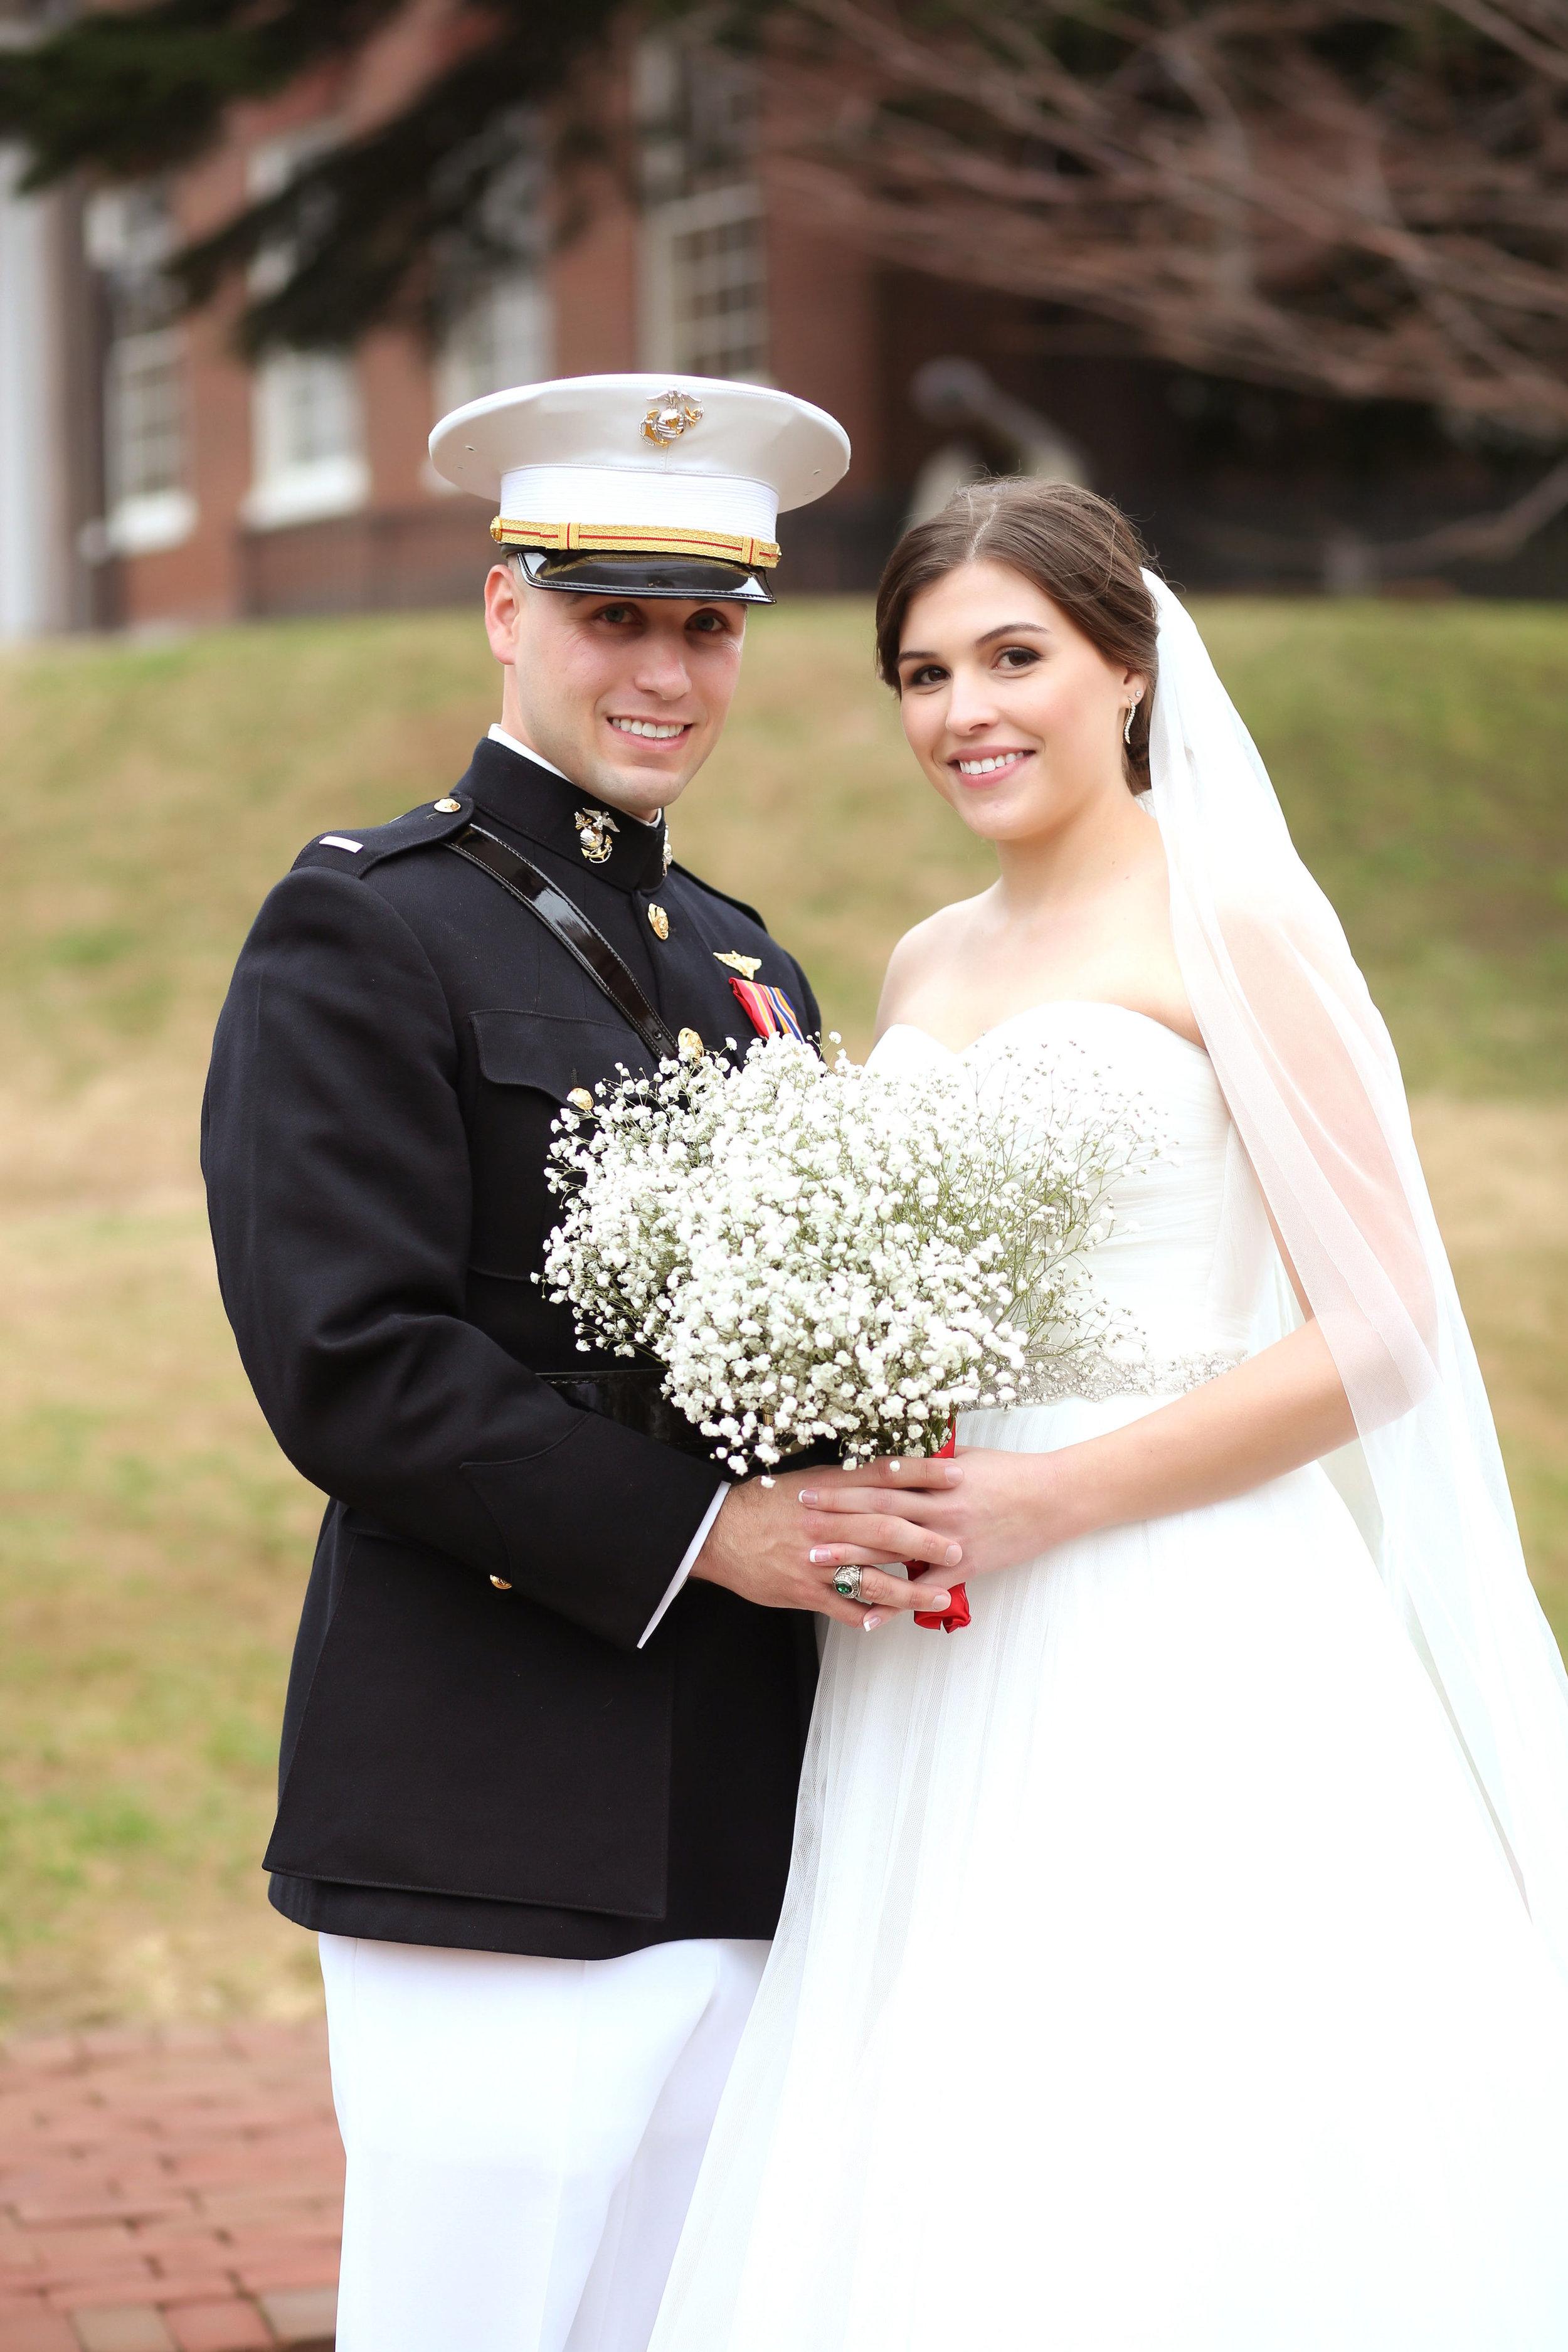 022418 MD Madison Dickson + Cody - Sarah Michele Photography-0009.jpg